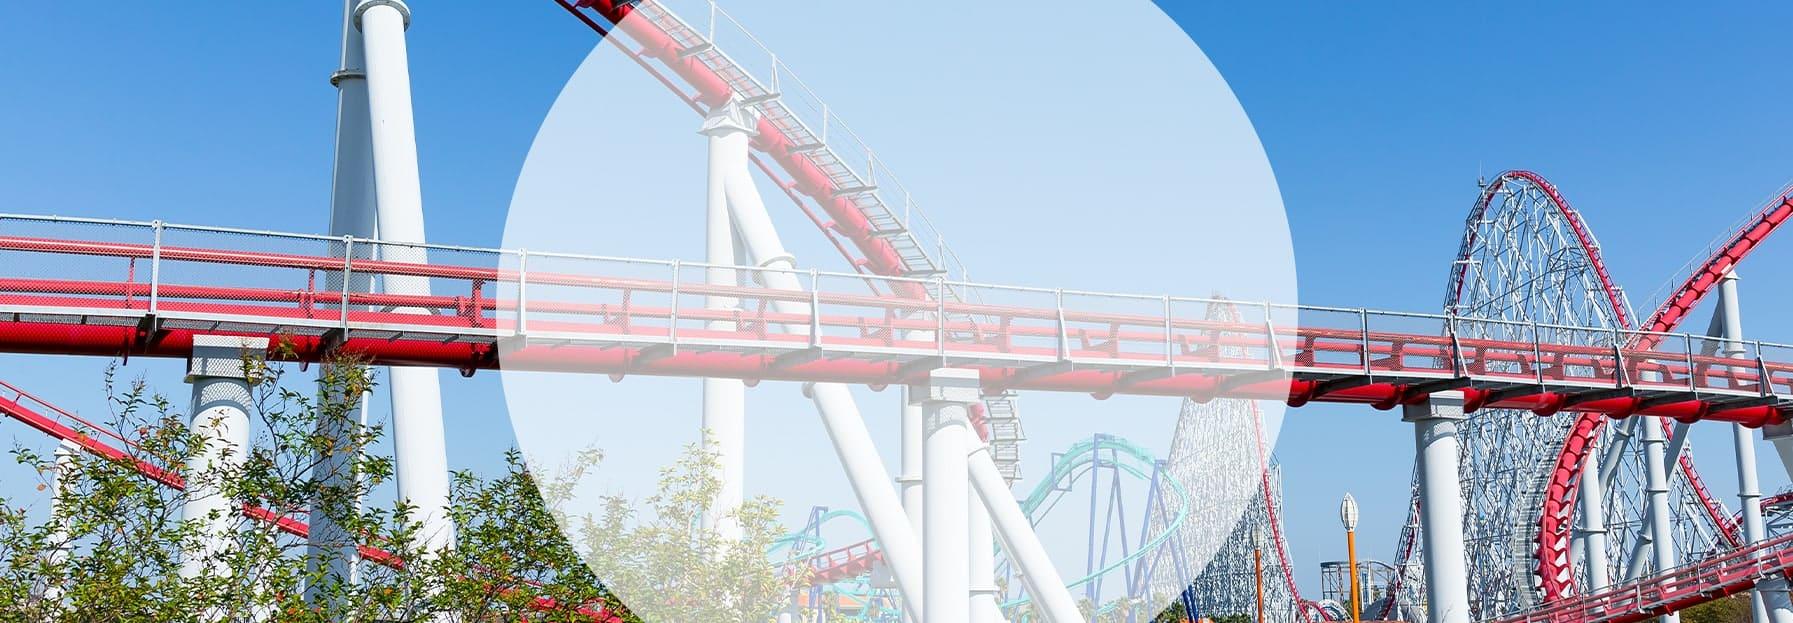 theme park rollercoaster - tourism & leisure